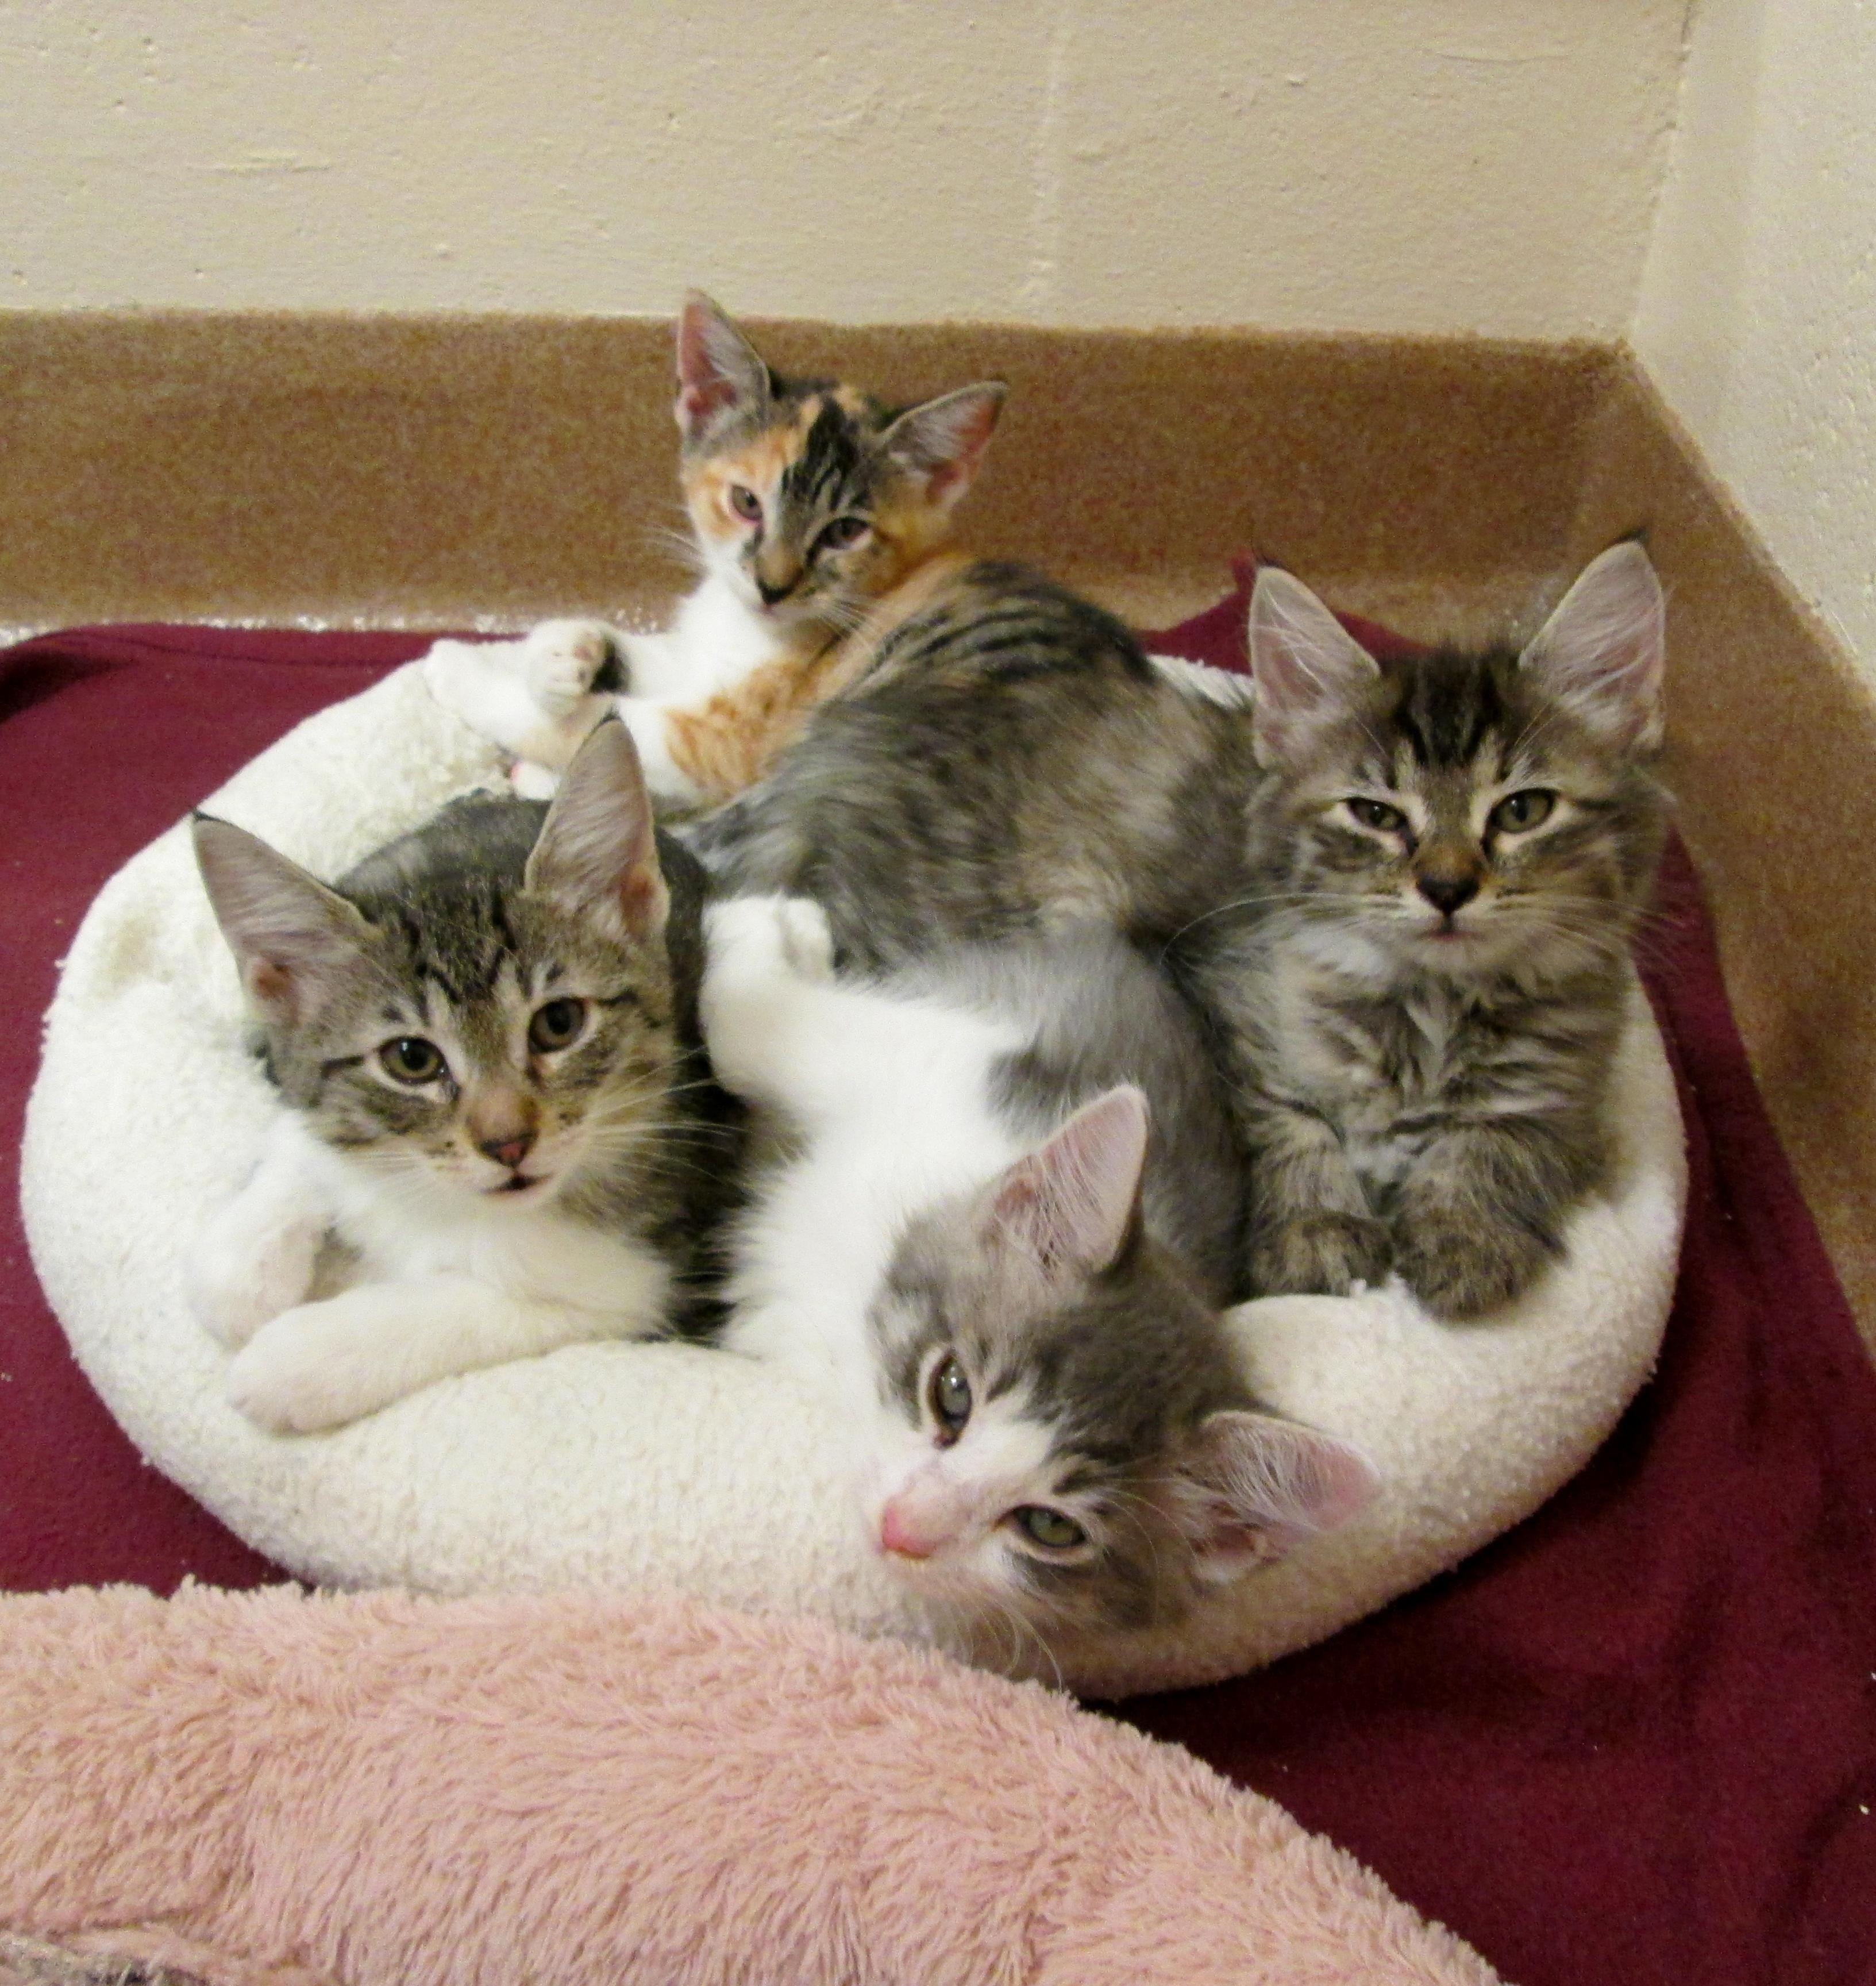 Cat For Adoption Kittens A Domestic Short Hair In Kittens Cat Petfinder Baby Fl Adoption Animal Pet Domes In 2020 Cat Adoption Kittens Cutest Cats And Kittens